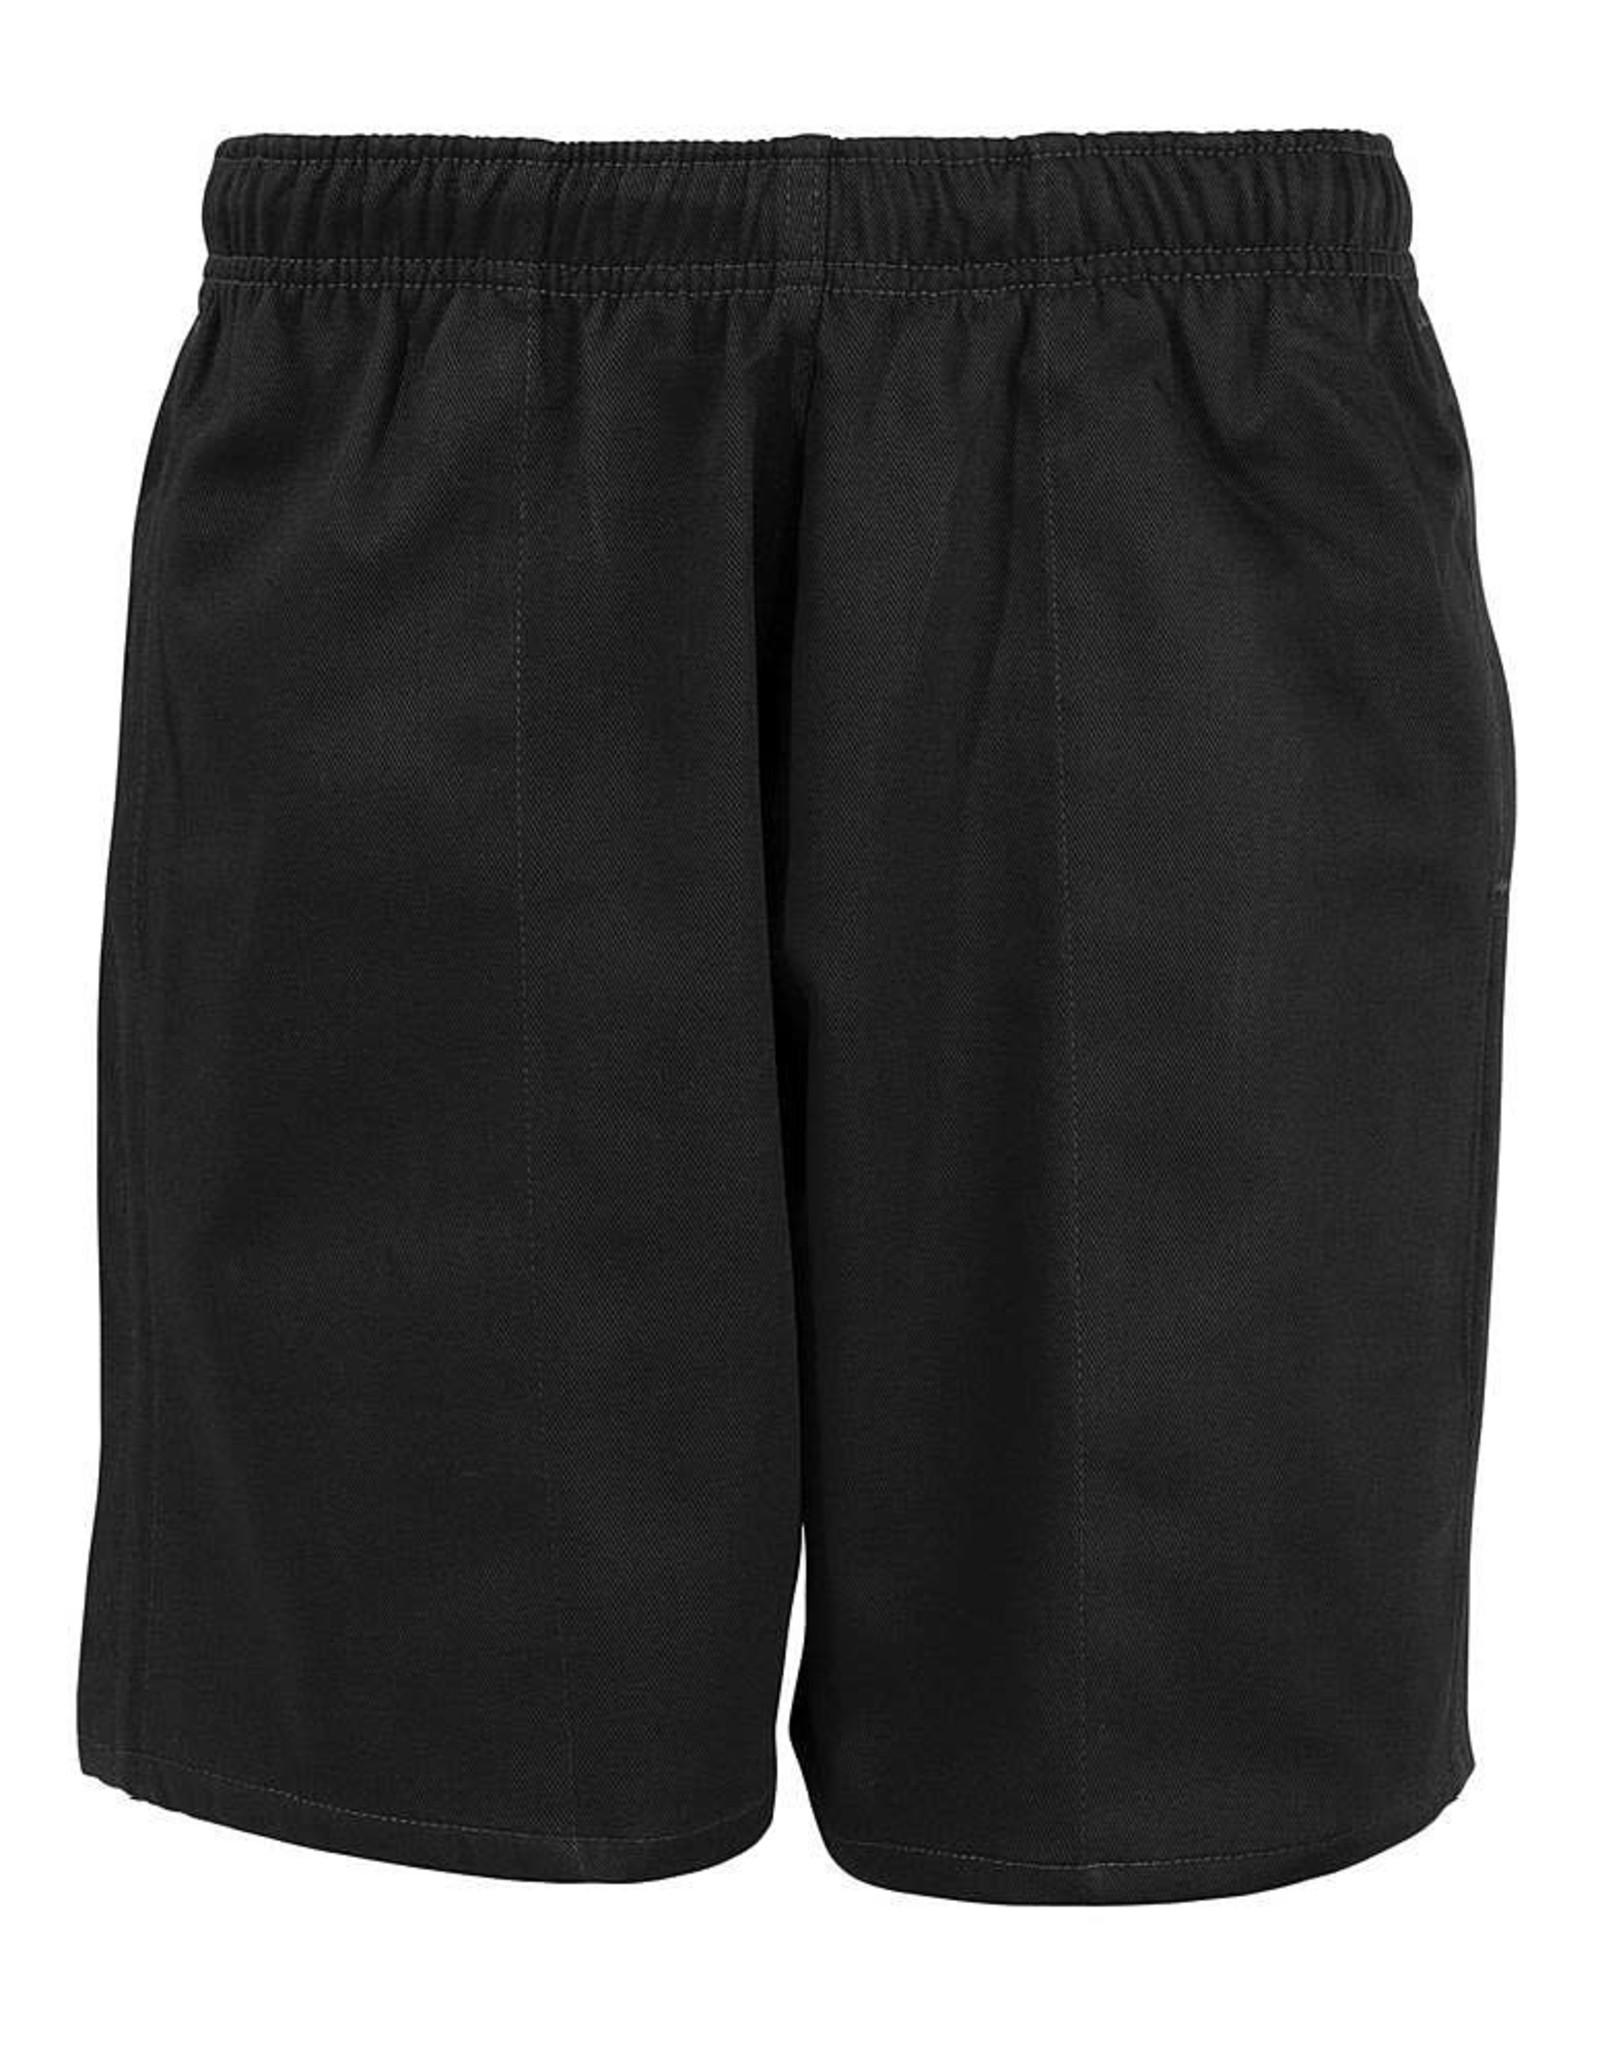 P.E. Shorts - Nicholas Chamberlaine School